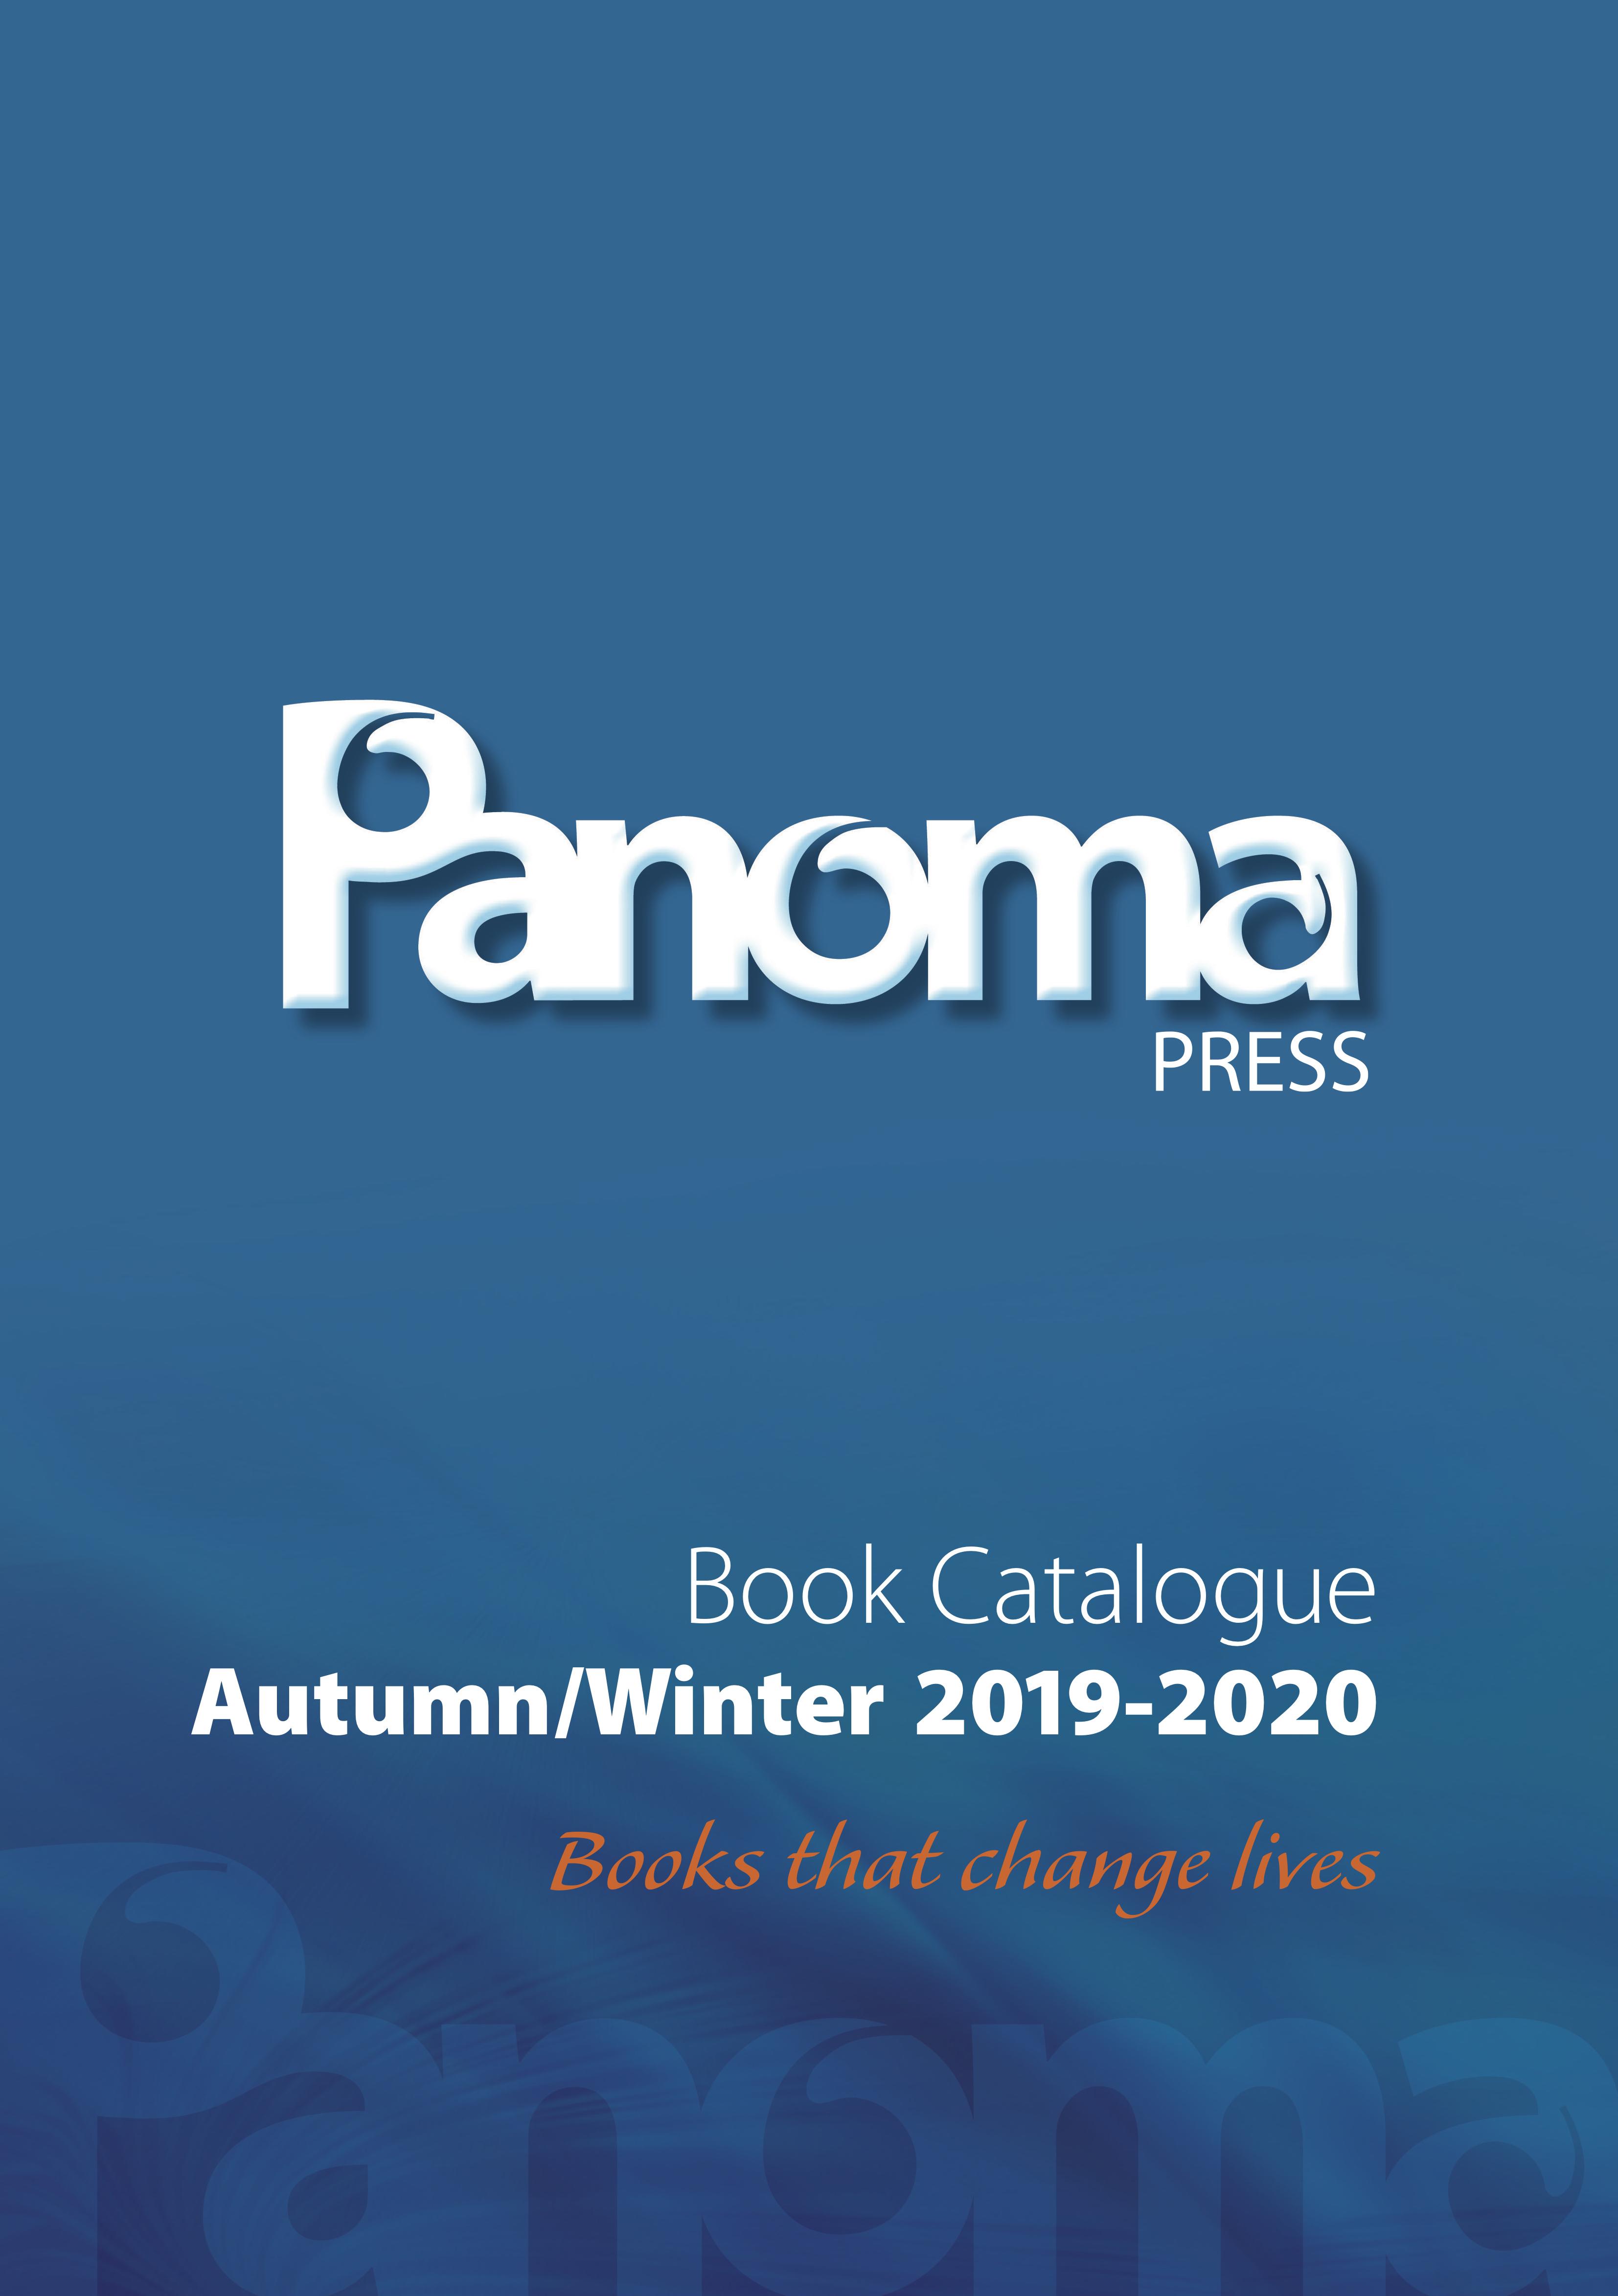 Panoma-Autumn-Winter-2019-2020-Catalogue